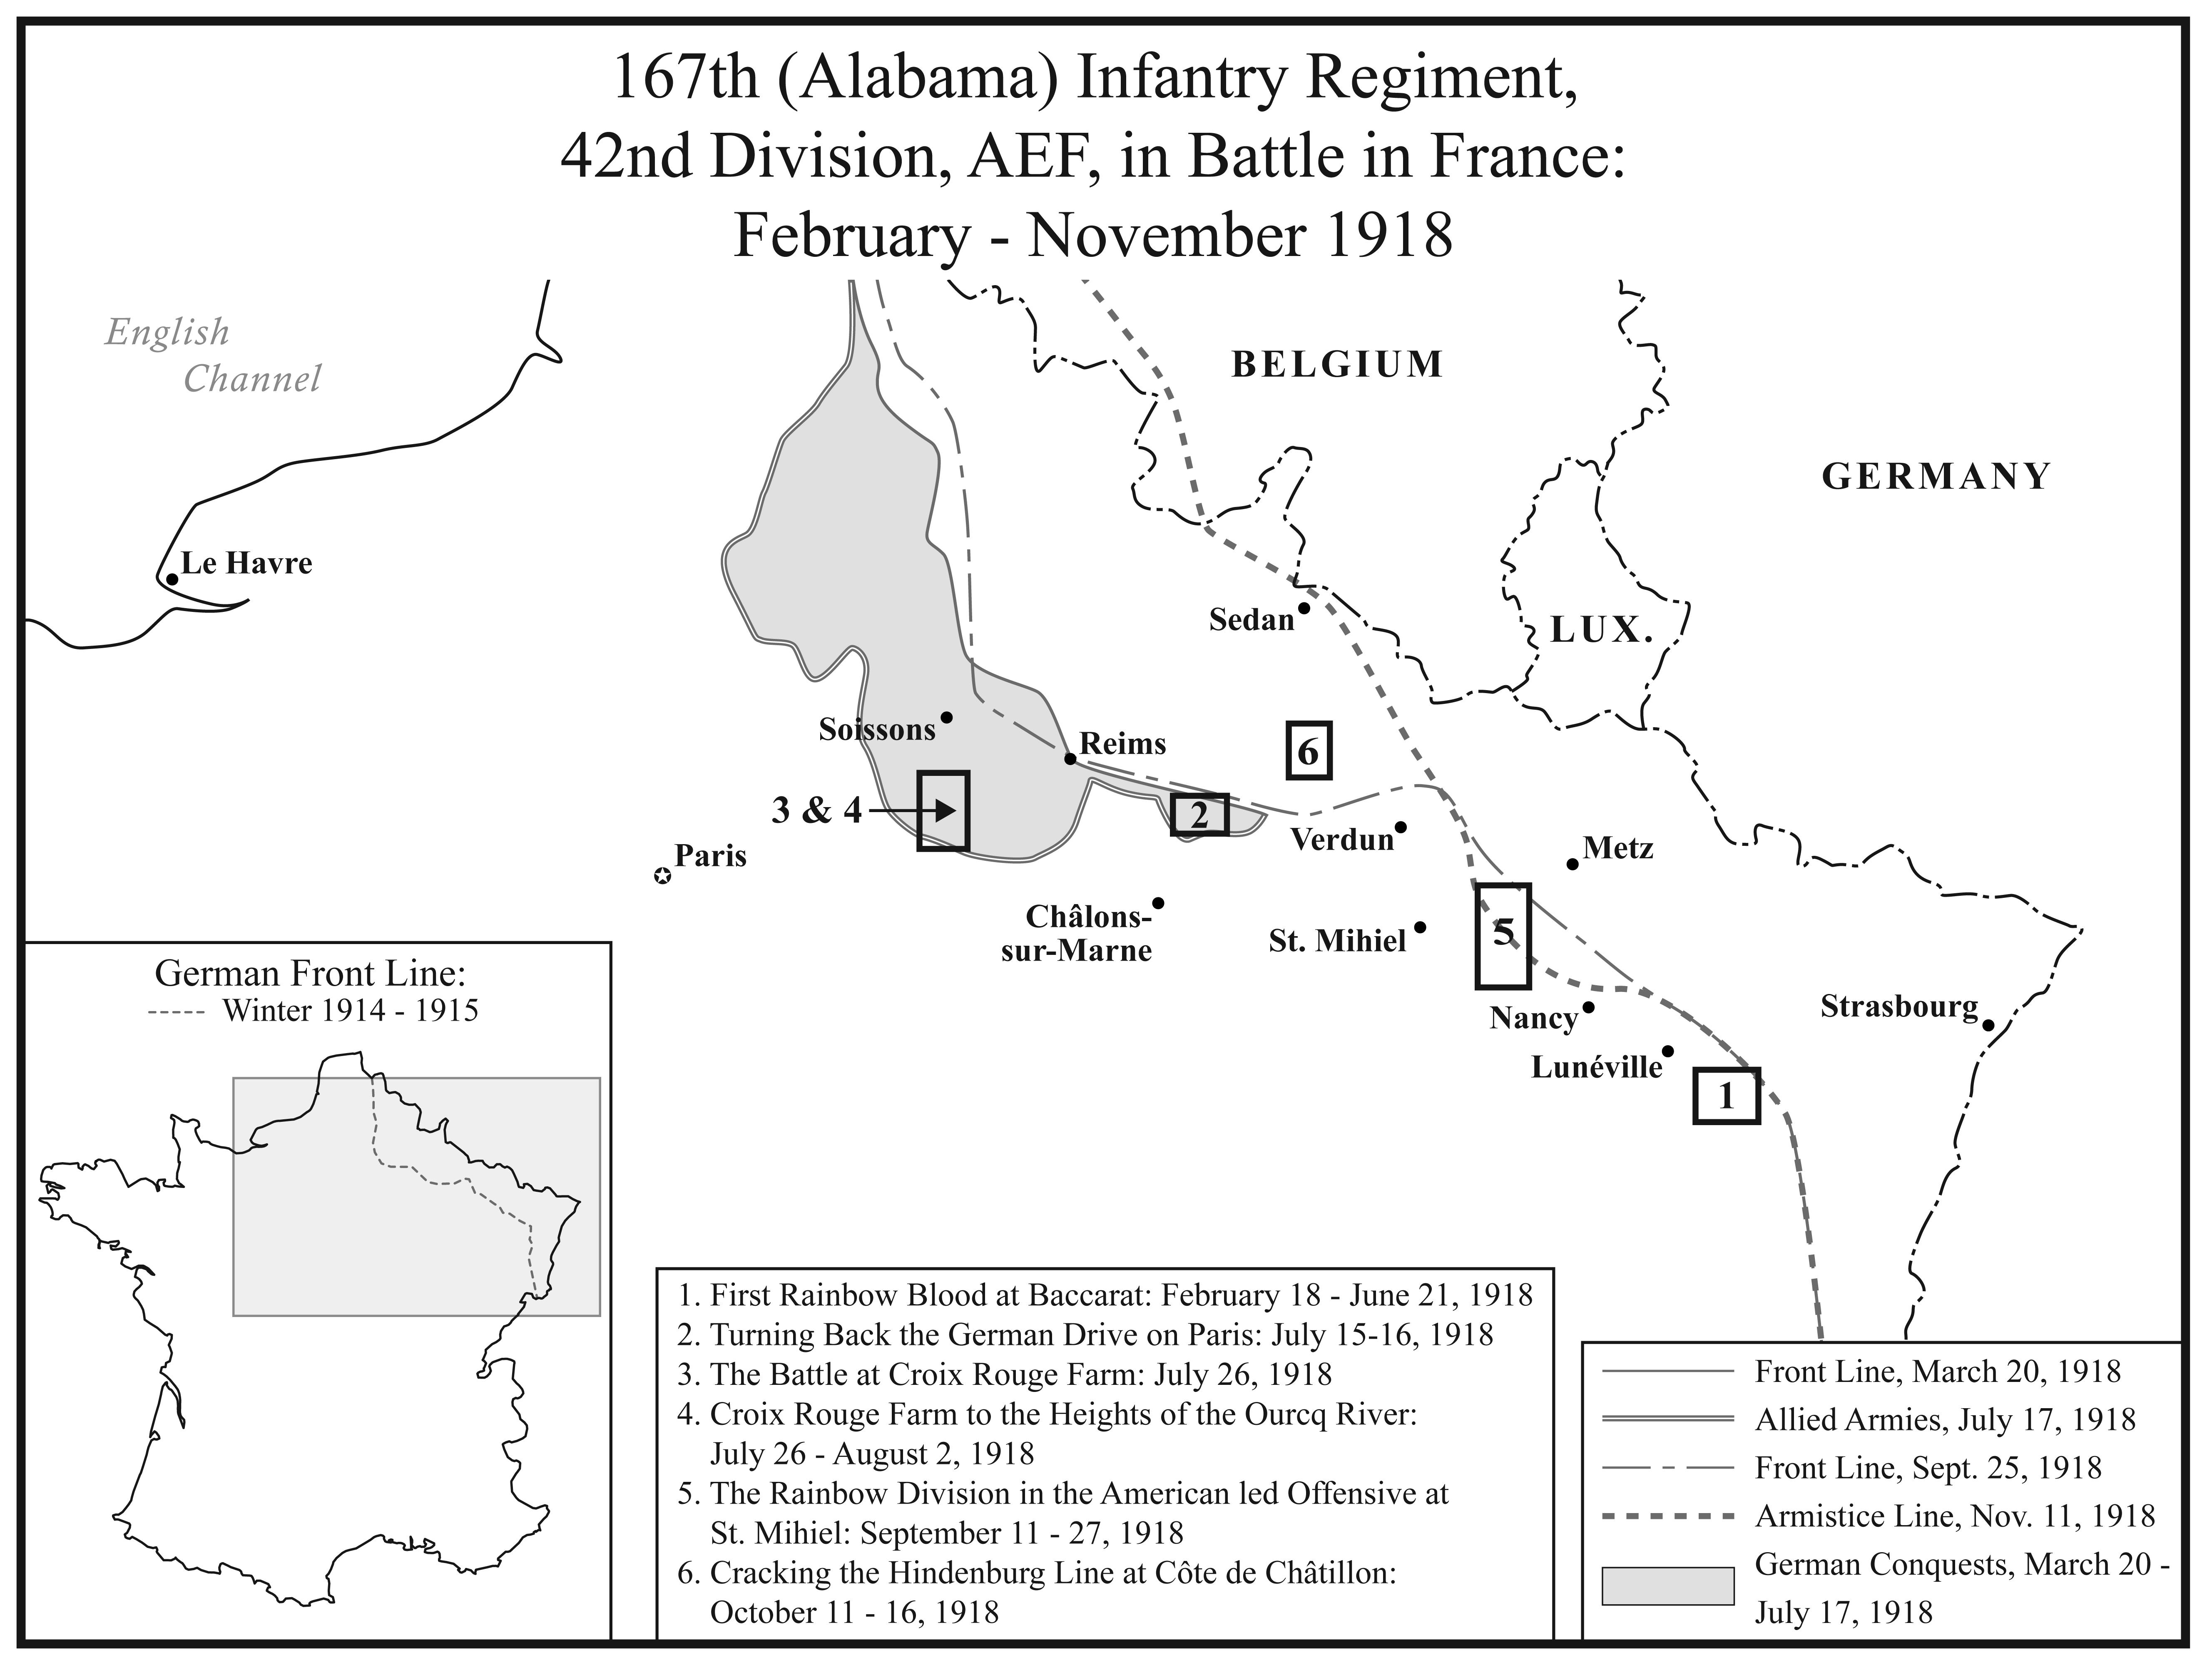 II. 167th Alabama Infantry Regiment in Battle in France.